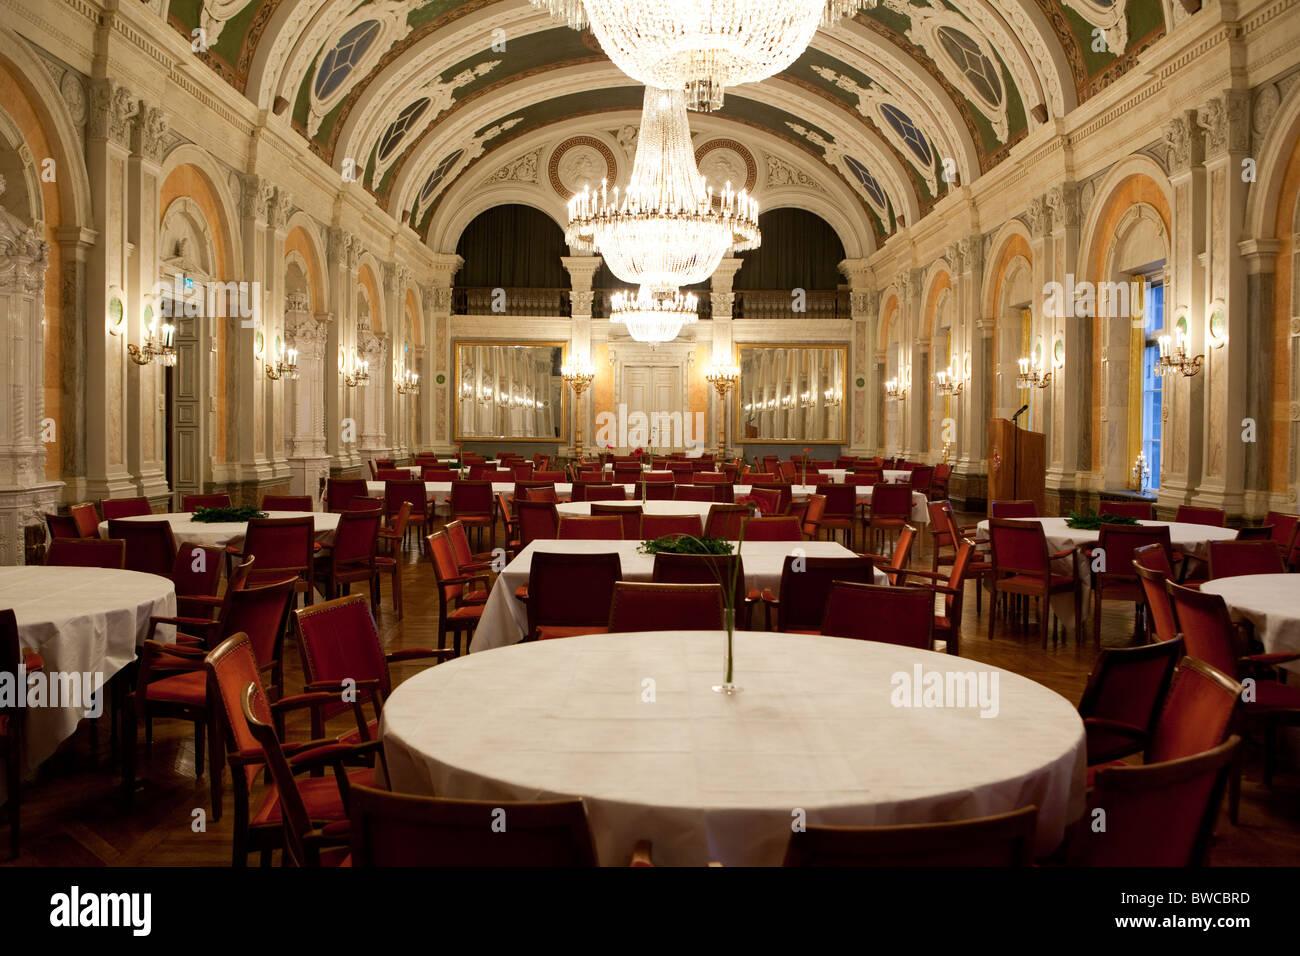 The dining room in City Hall, Malmo, Malmö. - Stock Image